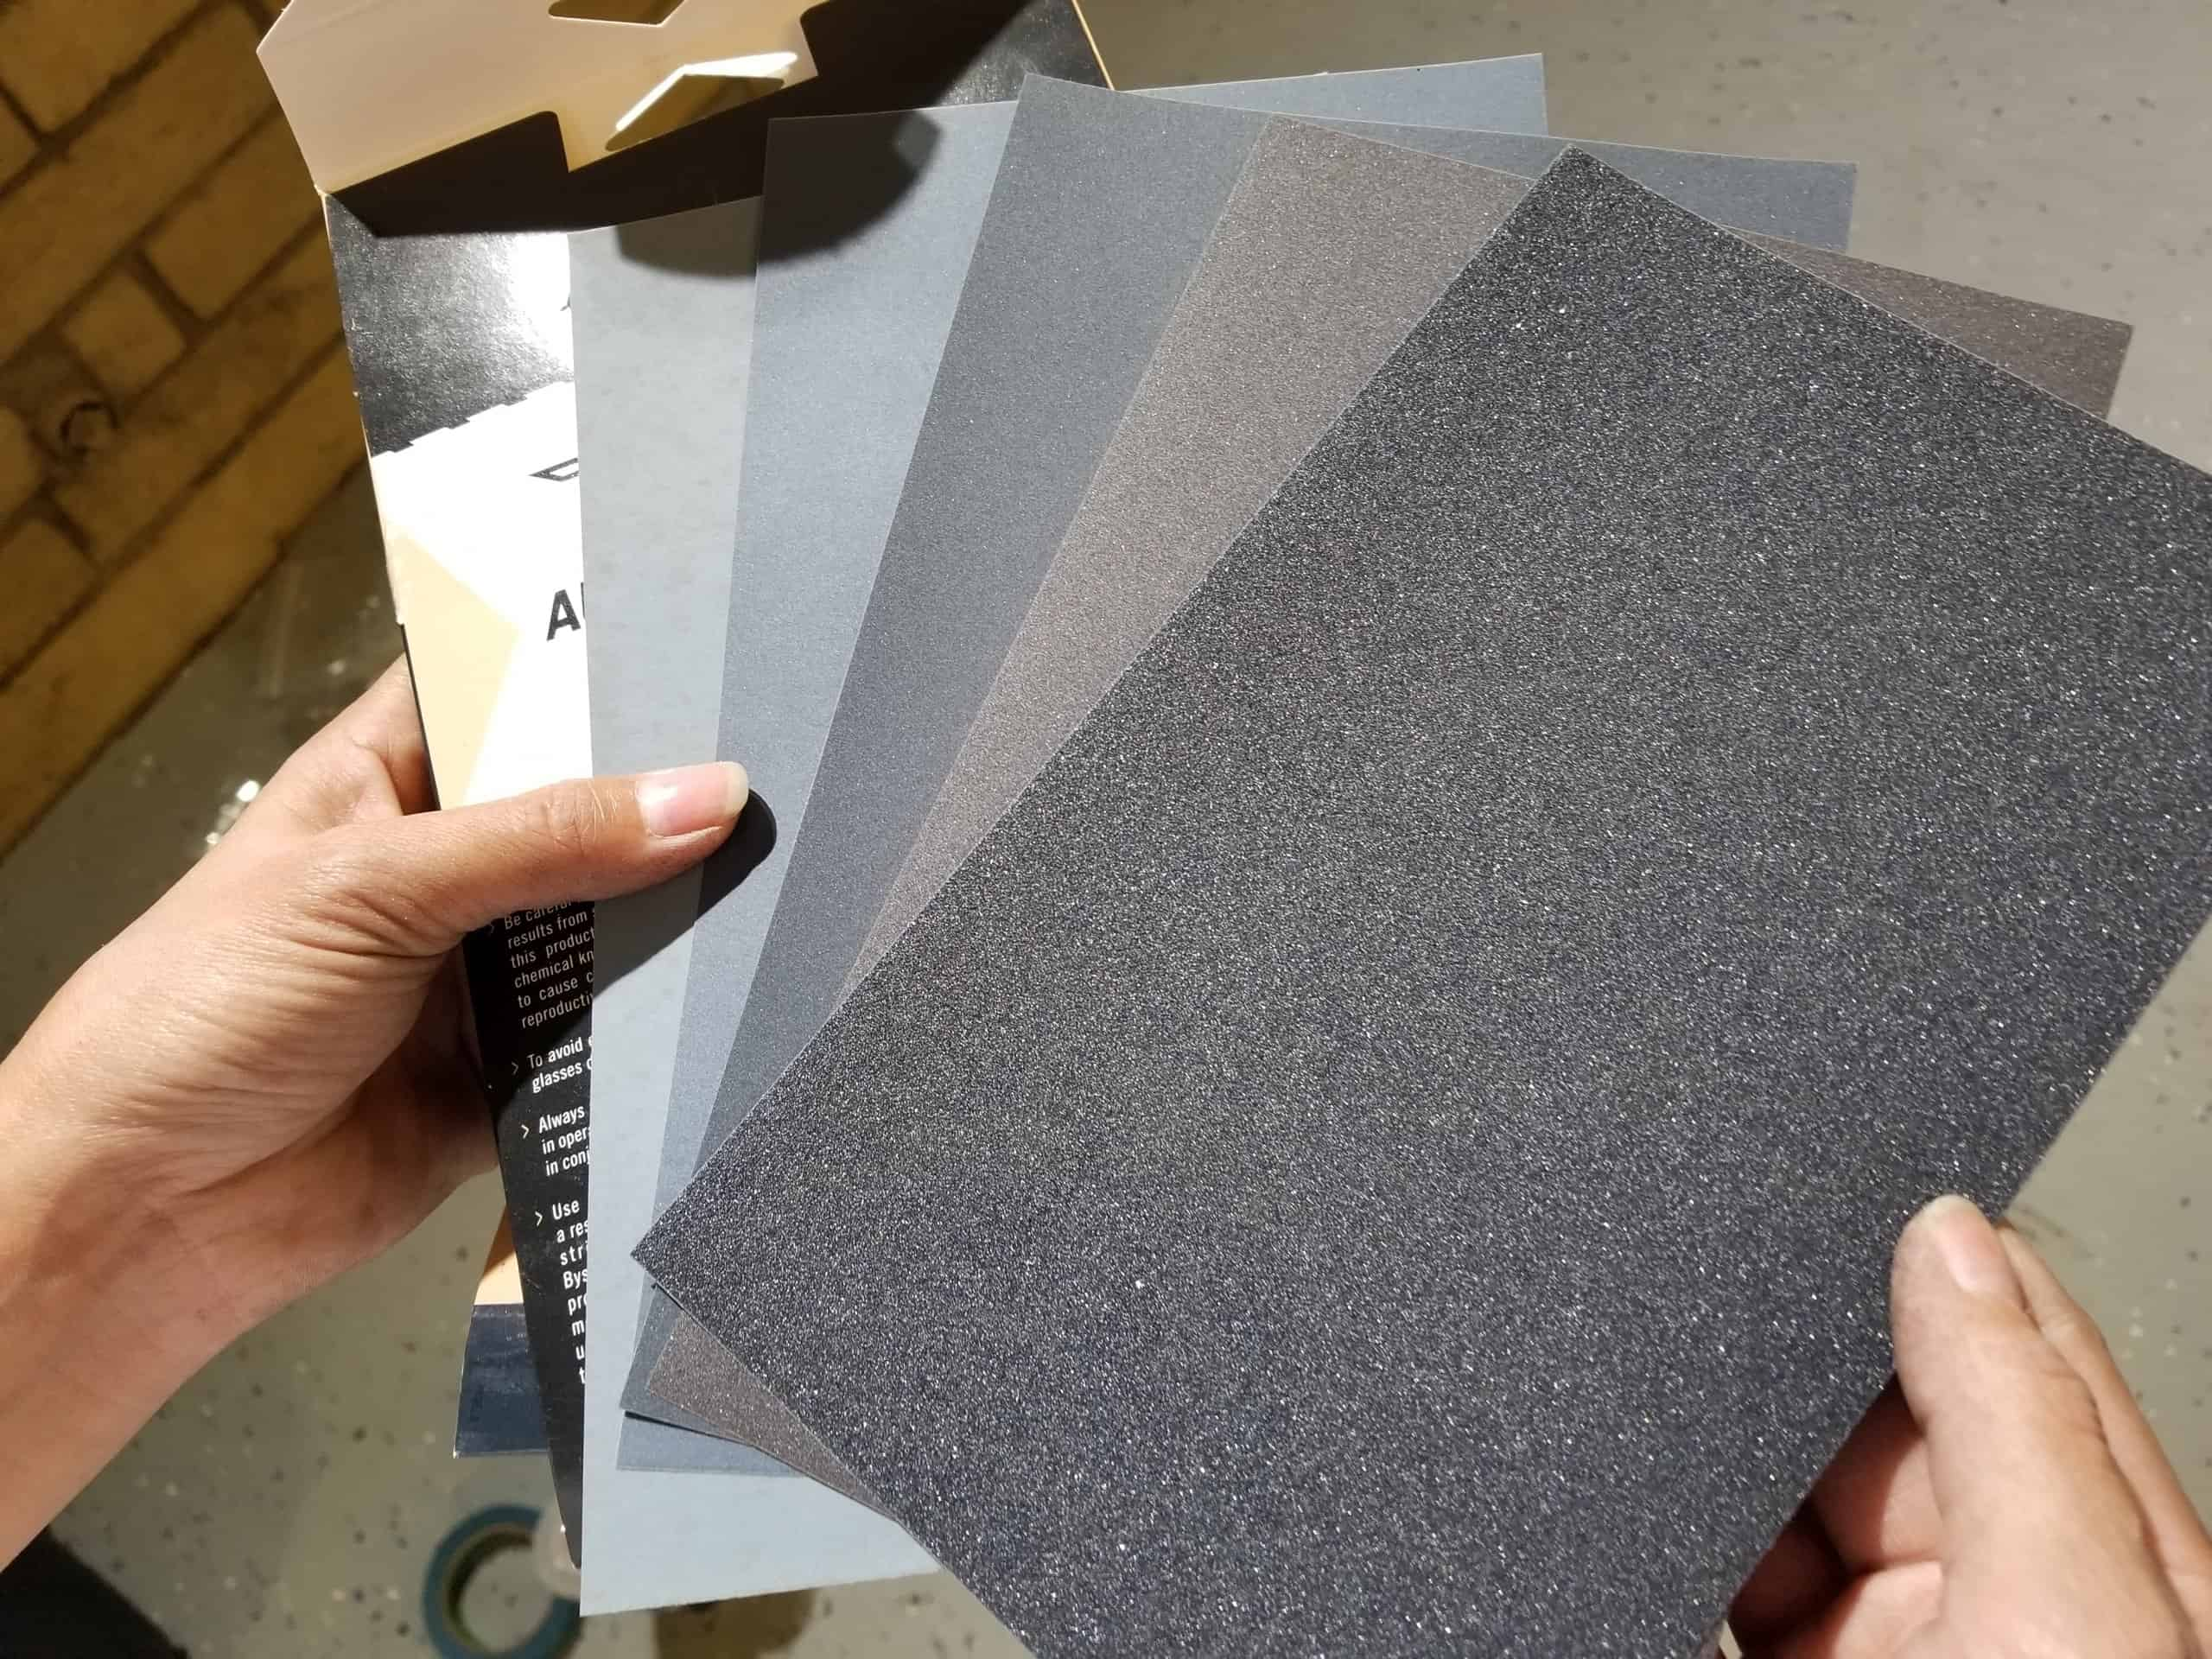 Automotive Touchup, DIYers rejoice: Automotive Touchup is rescuing your paint project, ClassicCars.com Journal